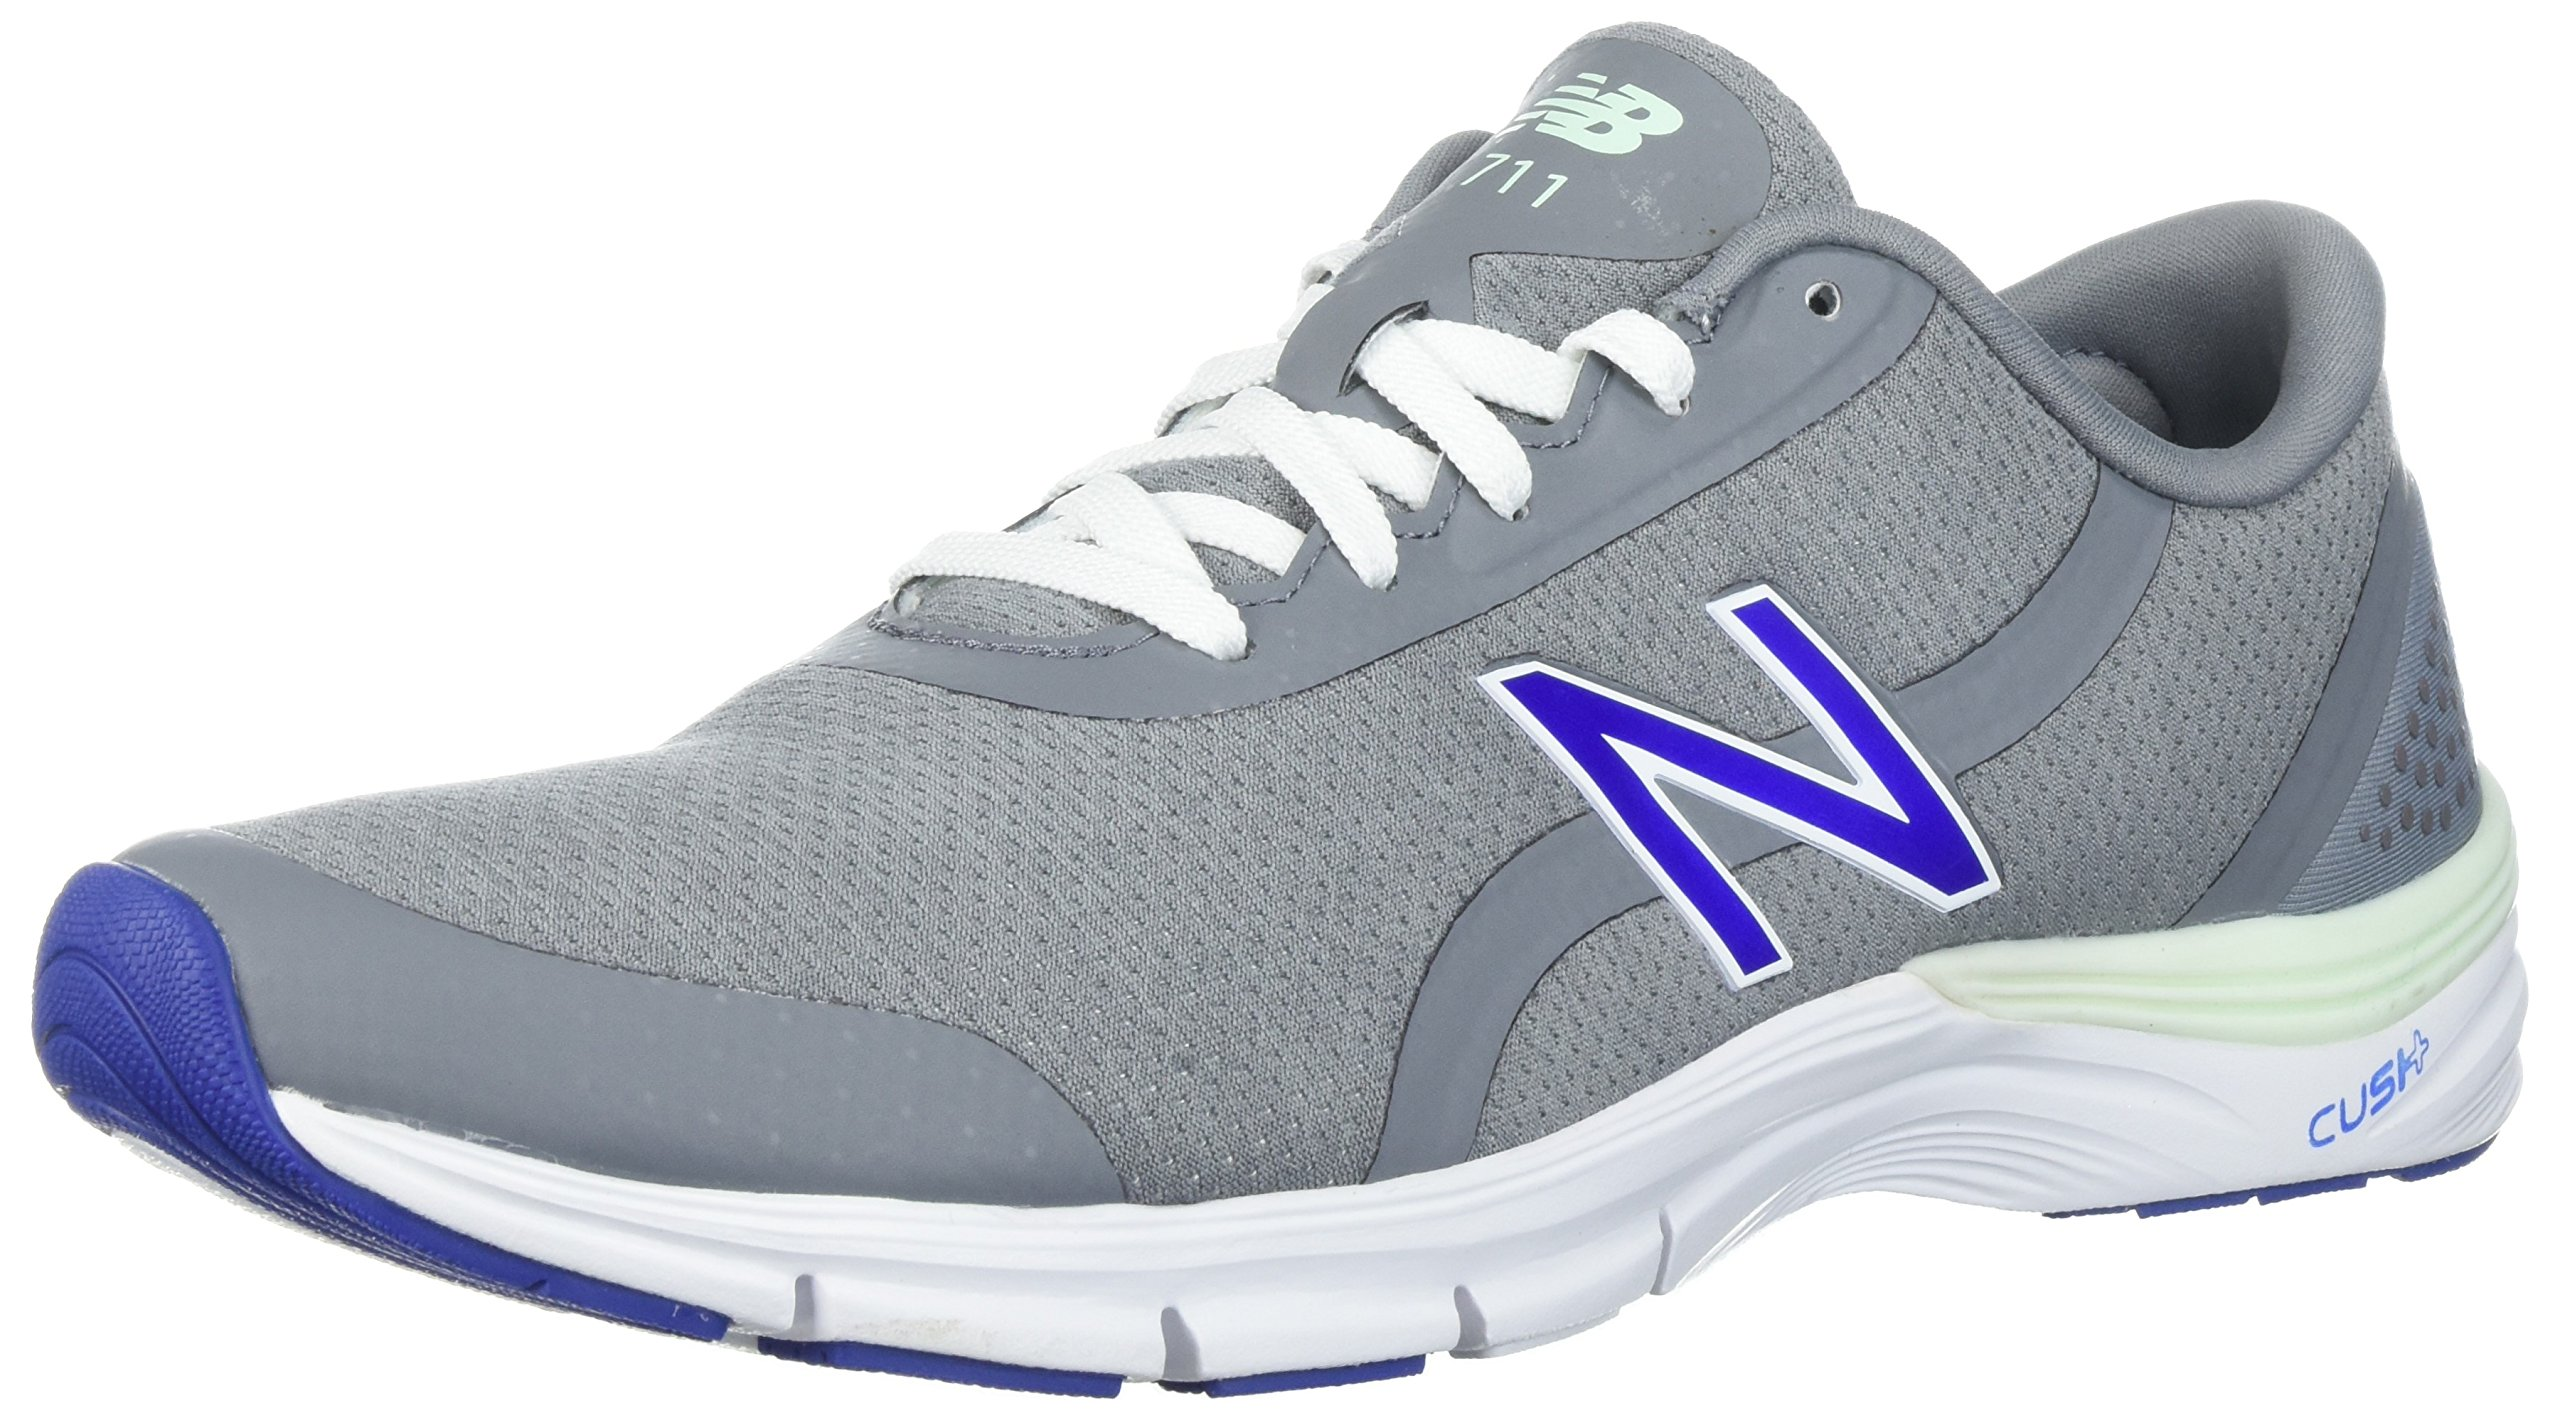 New Balance Women's 711v3 Cross-Trainer-Shoes, Steel/Blue Iris, 10.5 B US